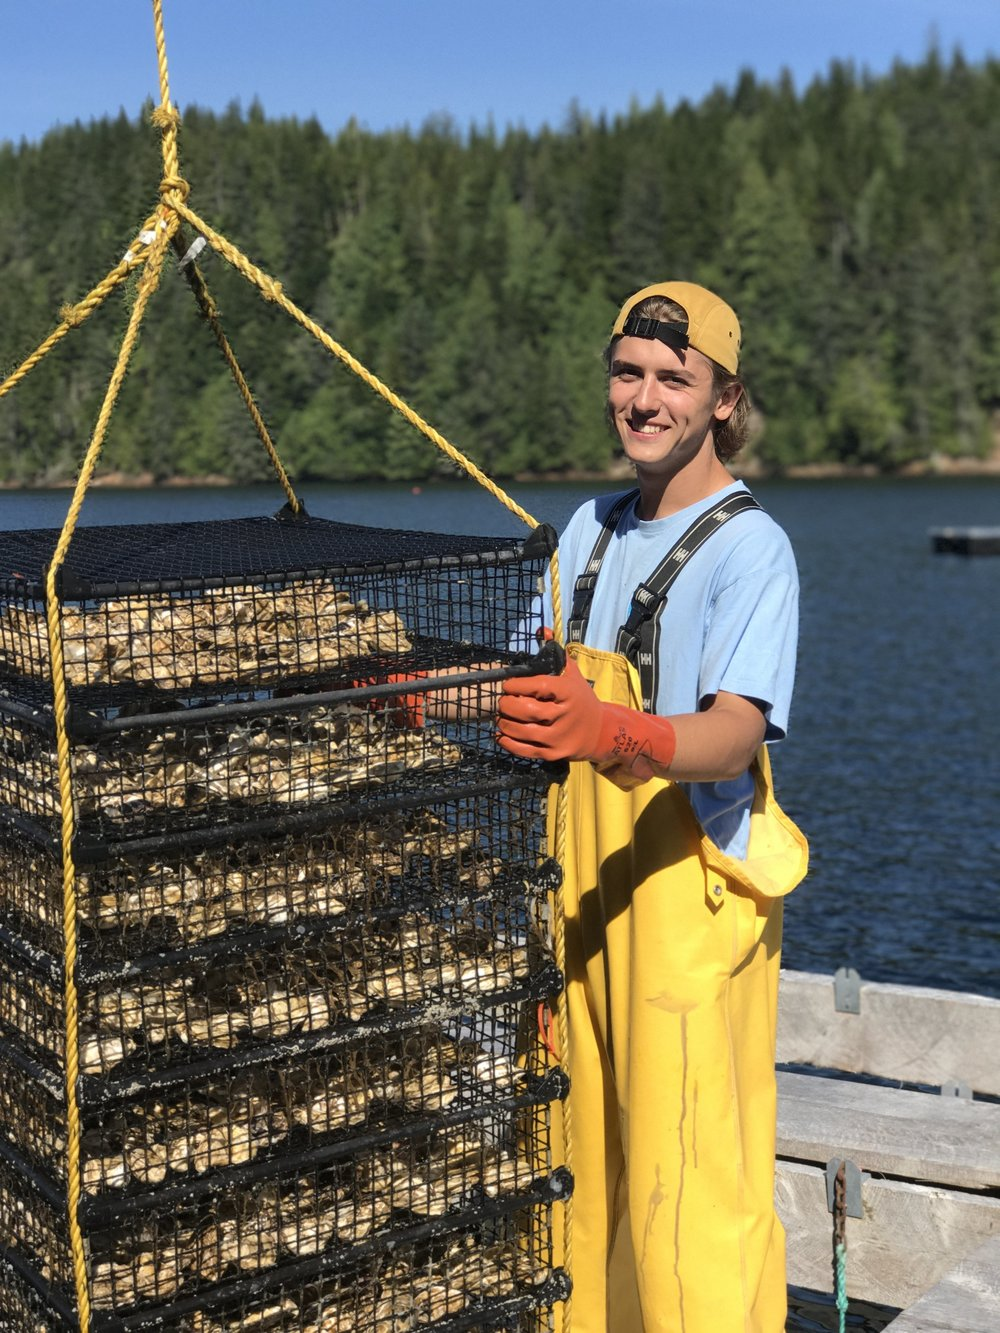 Harvesting Oyters